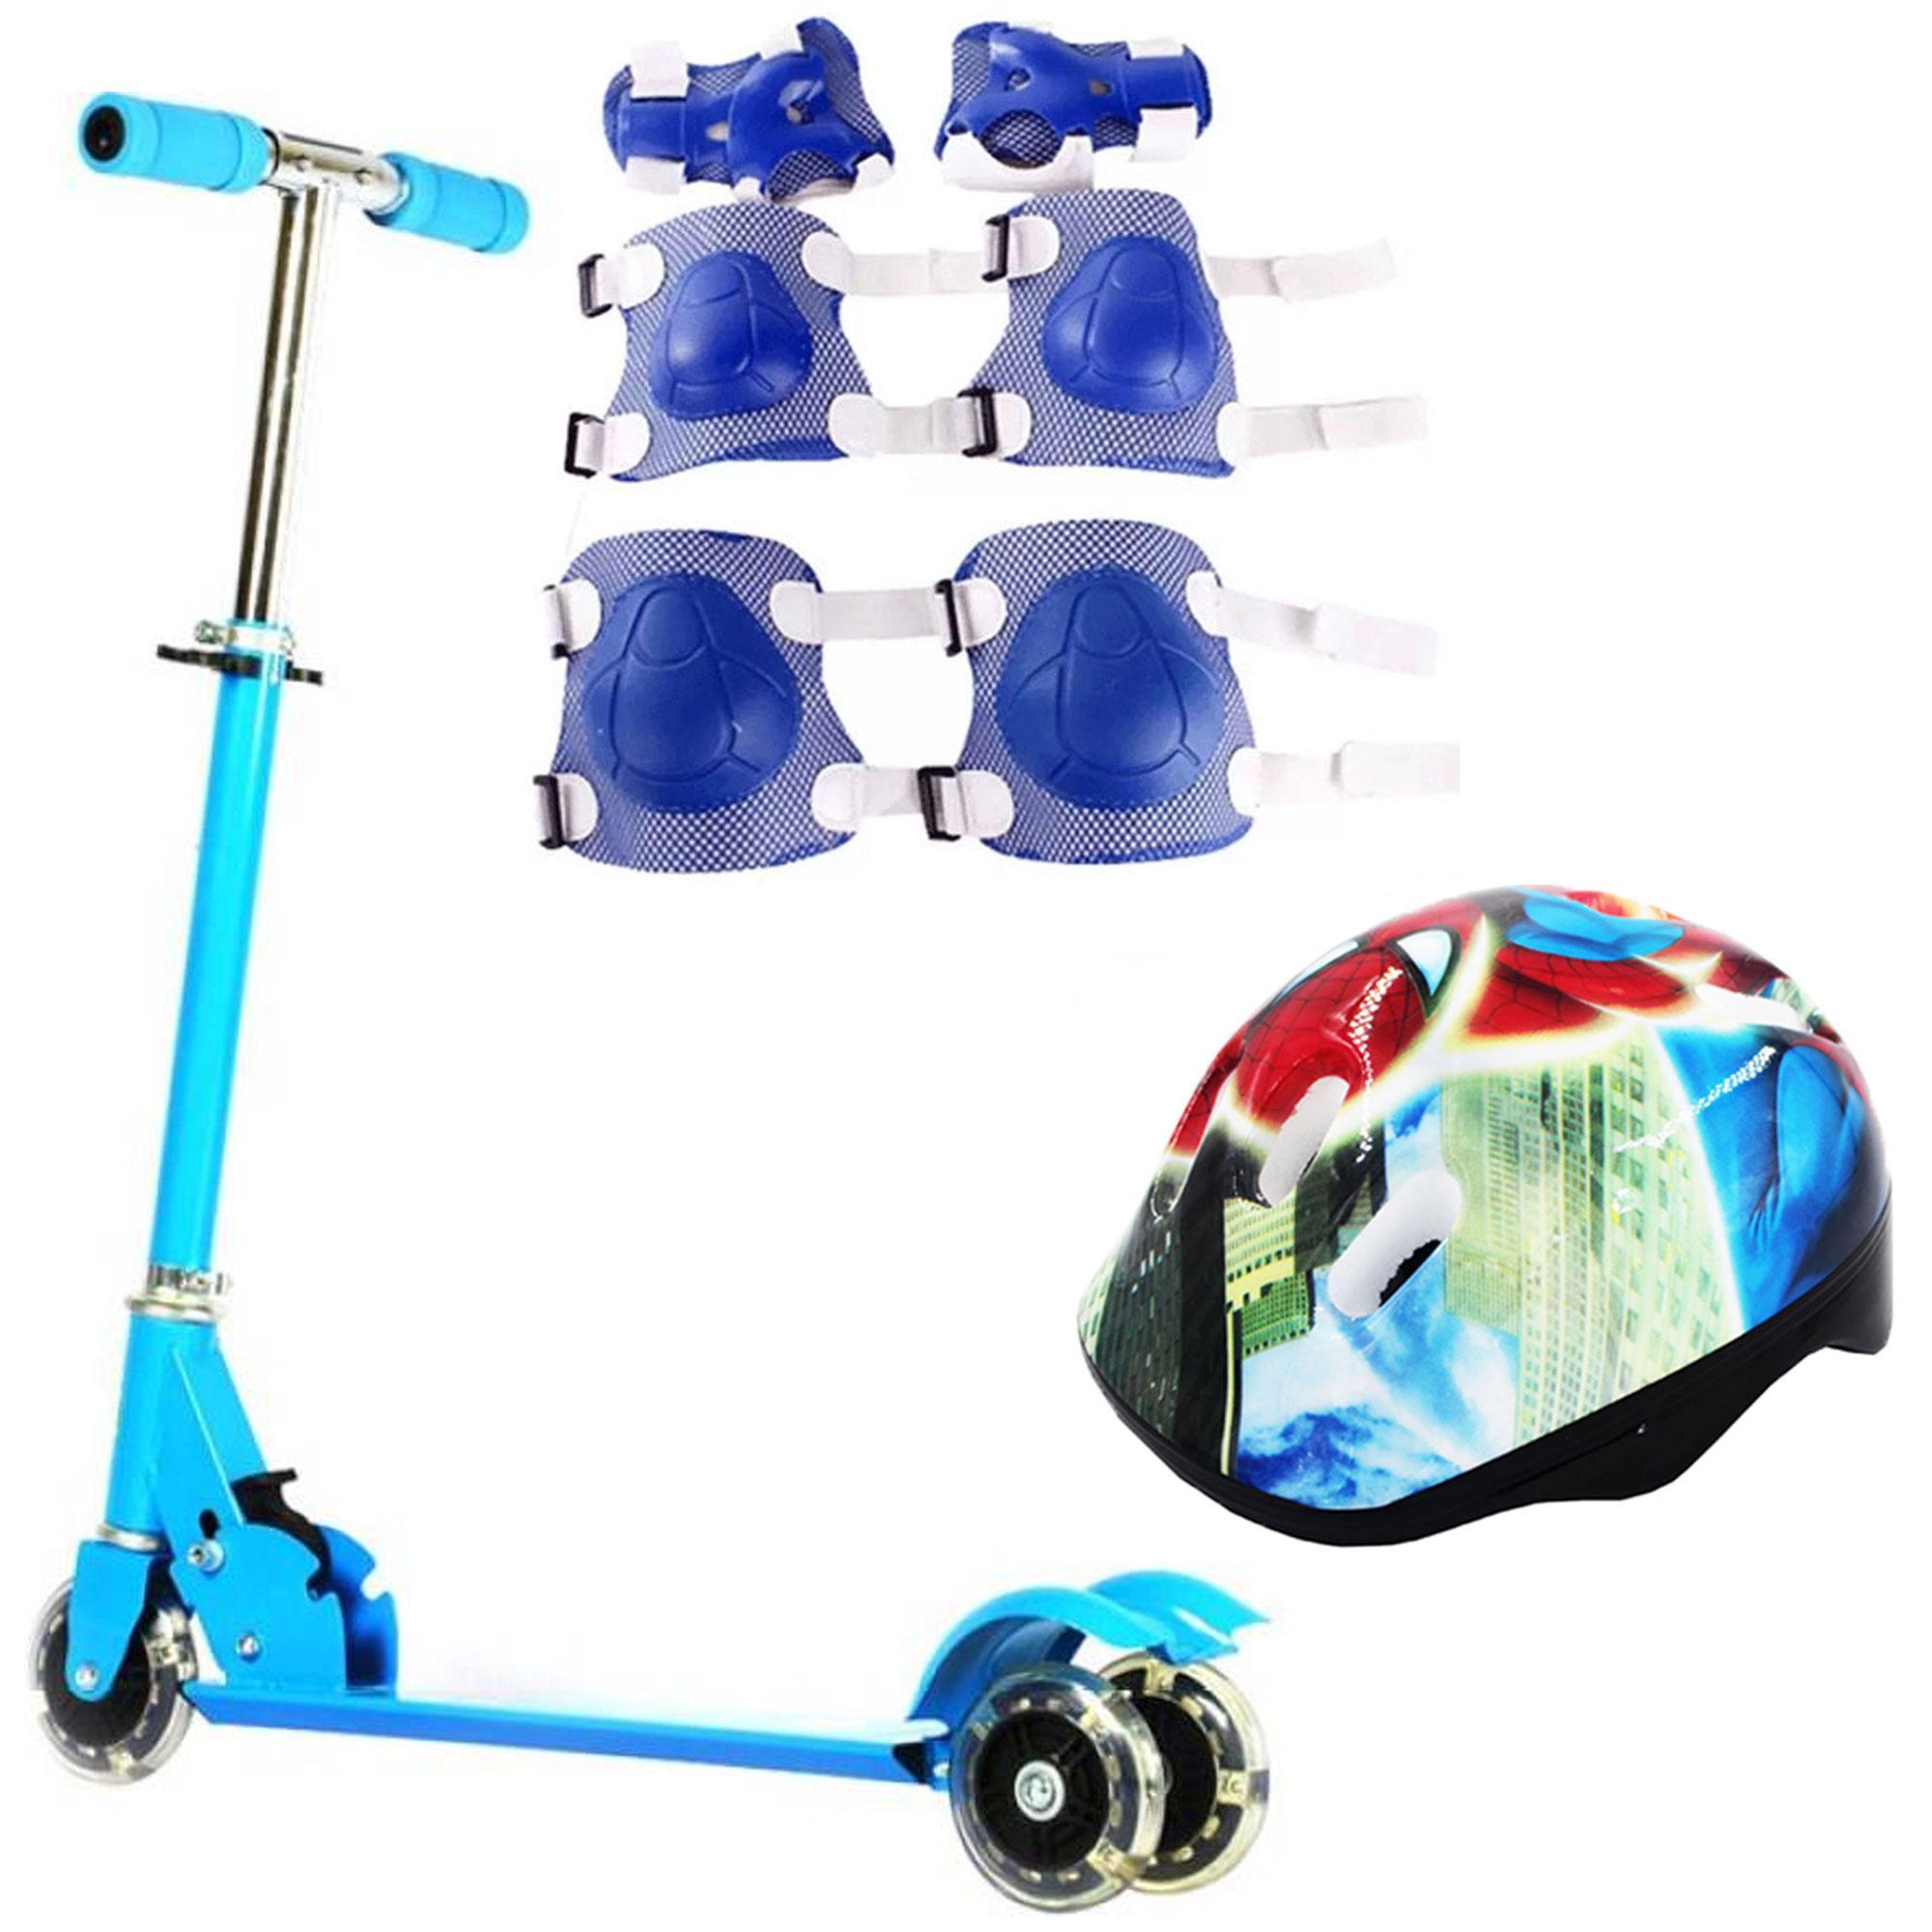 Little Jr 3 Wheels Scooter (light Blue) With Kids Helmet Blue And 6-Piece Set Protective Pad Blue 1 Set By Gonzalez General Merchandise.